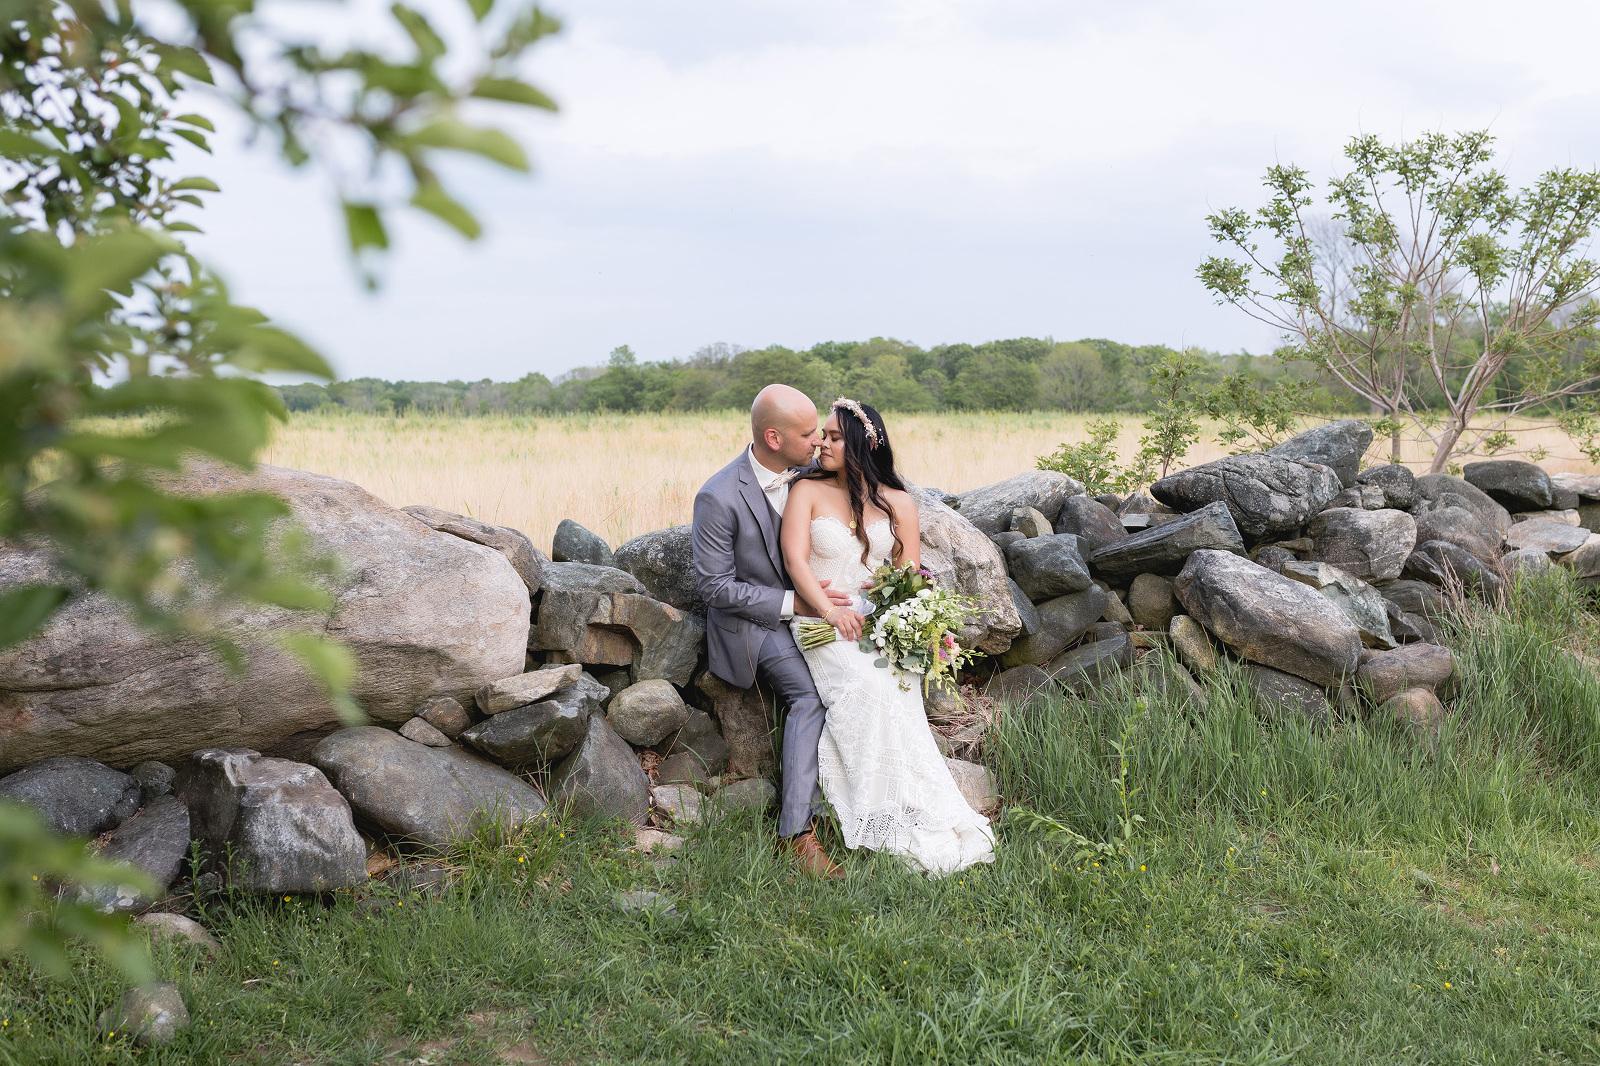 bride and groom jonathan edwards winery rock wall